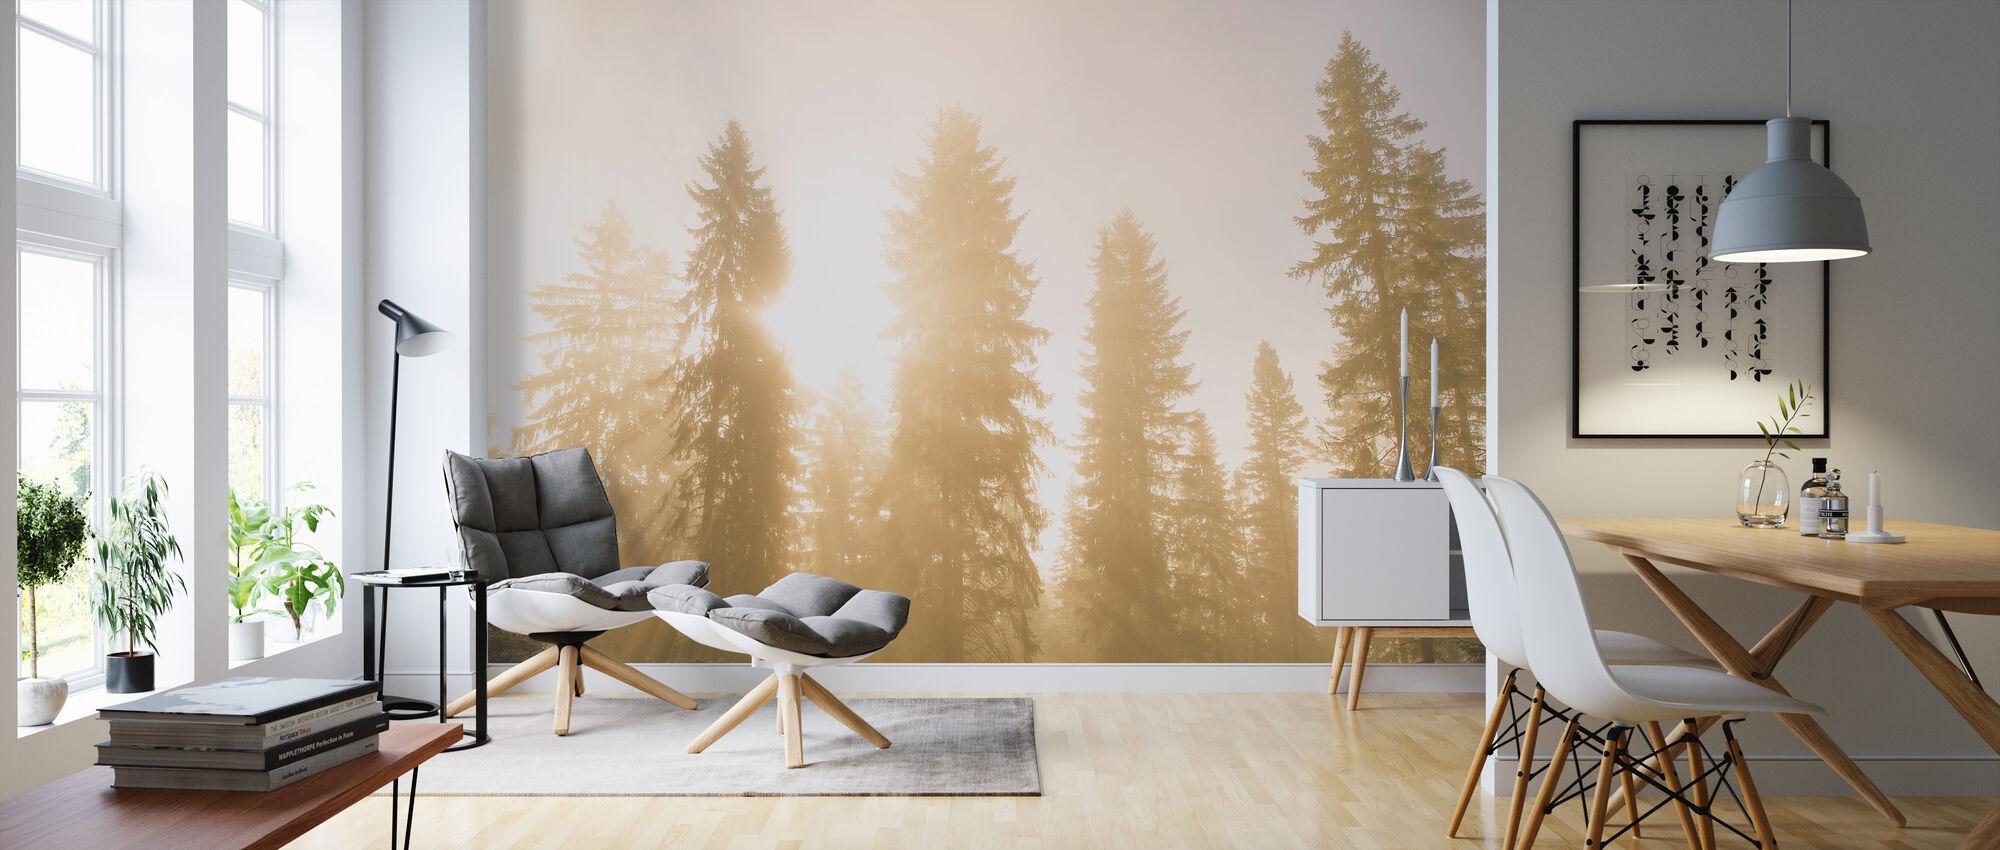 Golden Ray - Wallpaper - Living Room